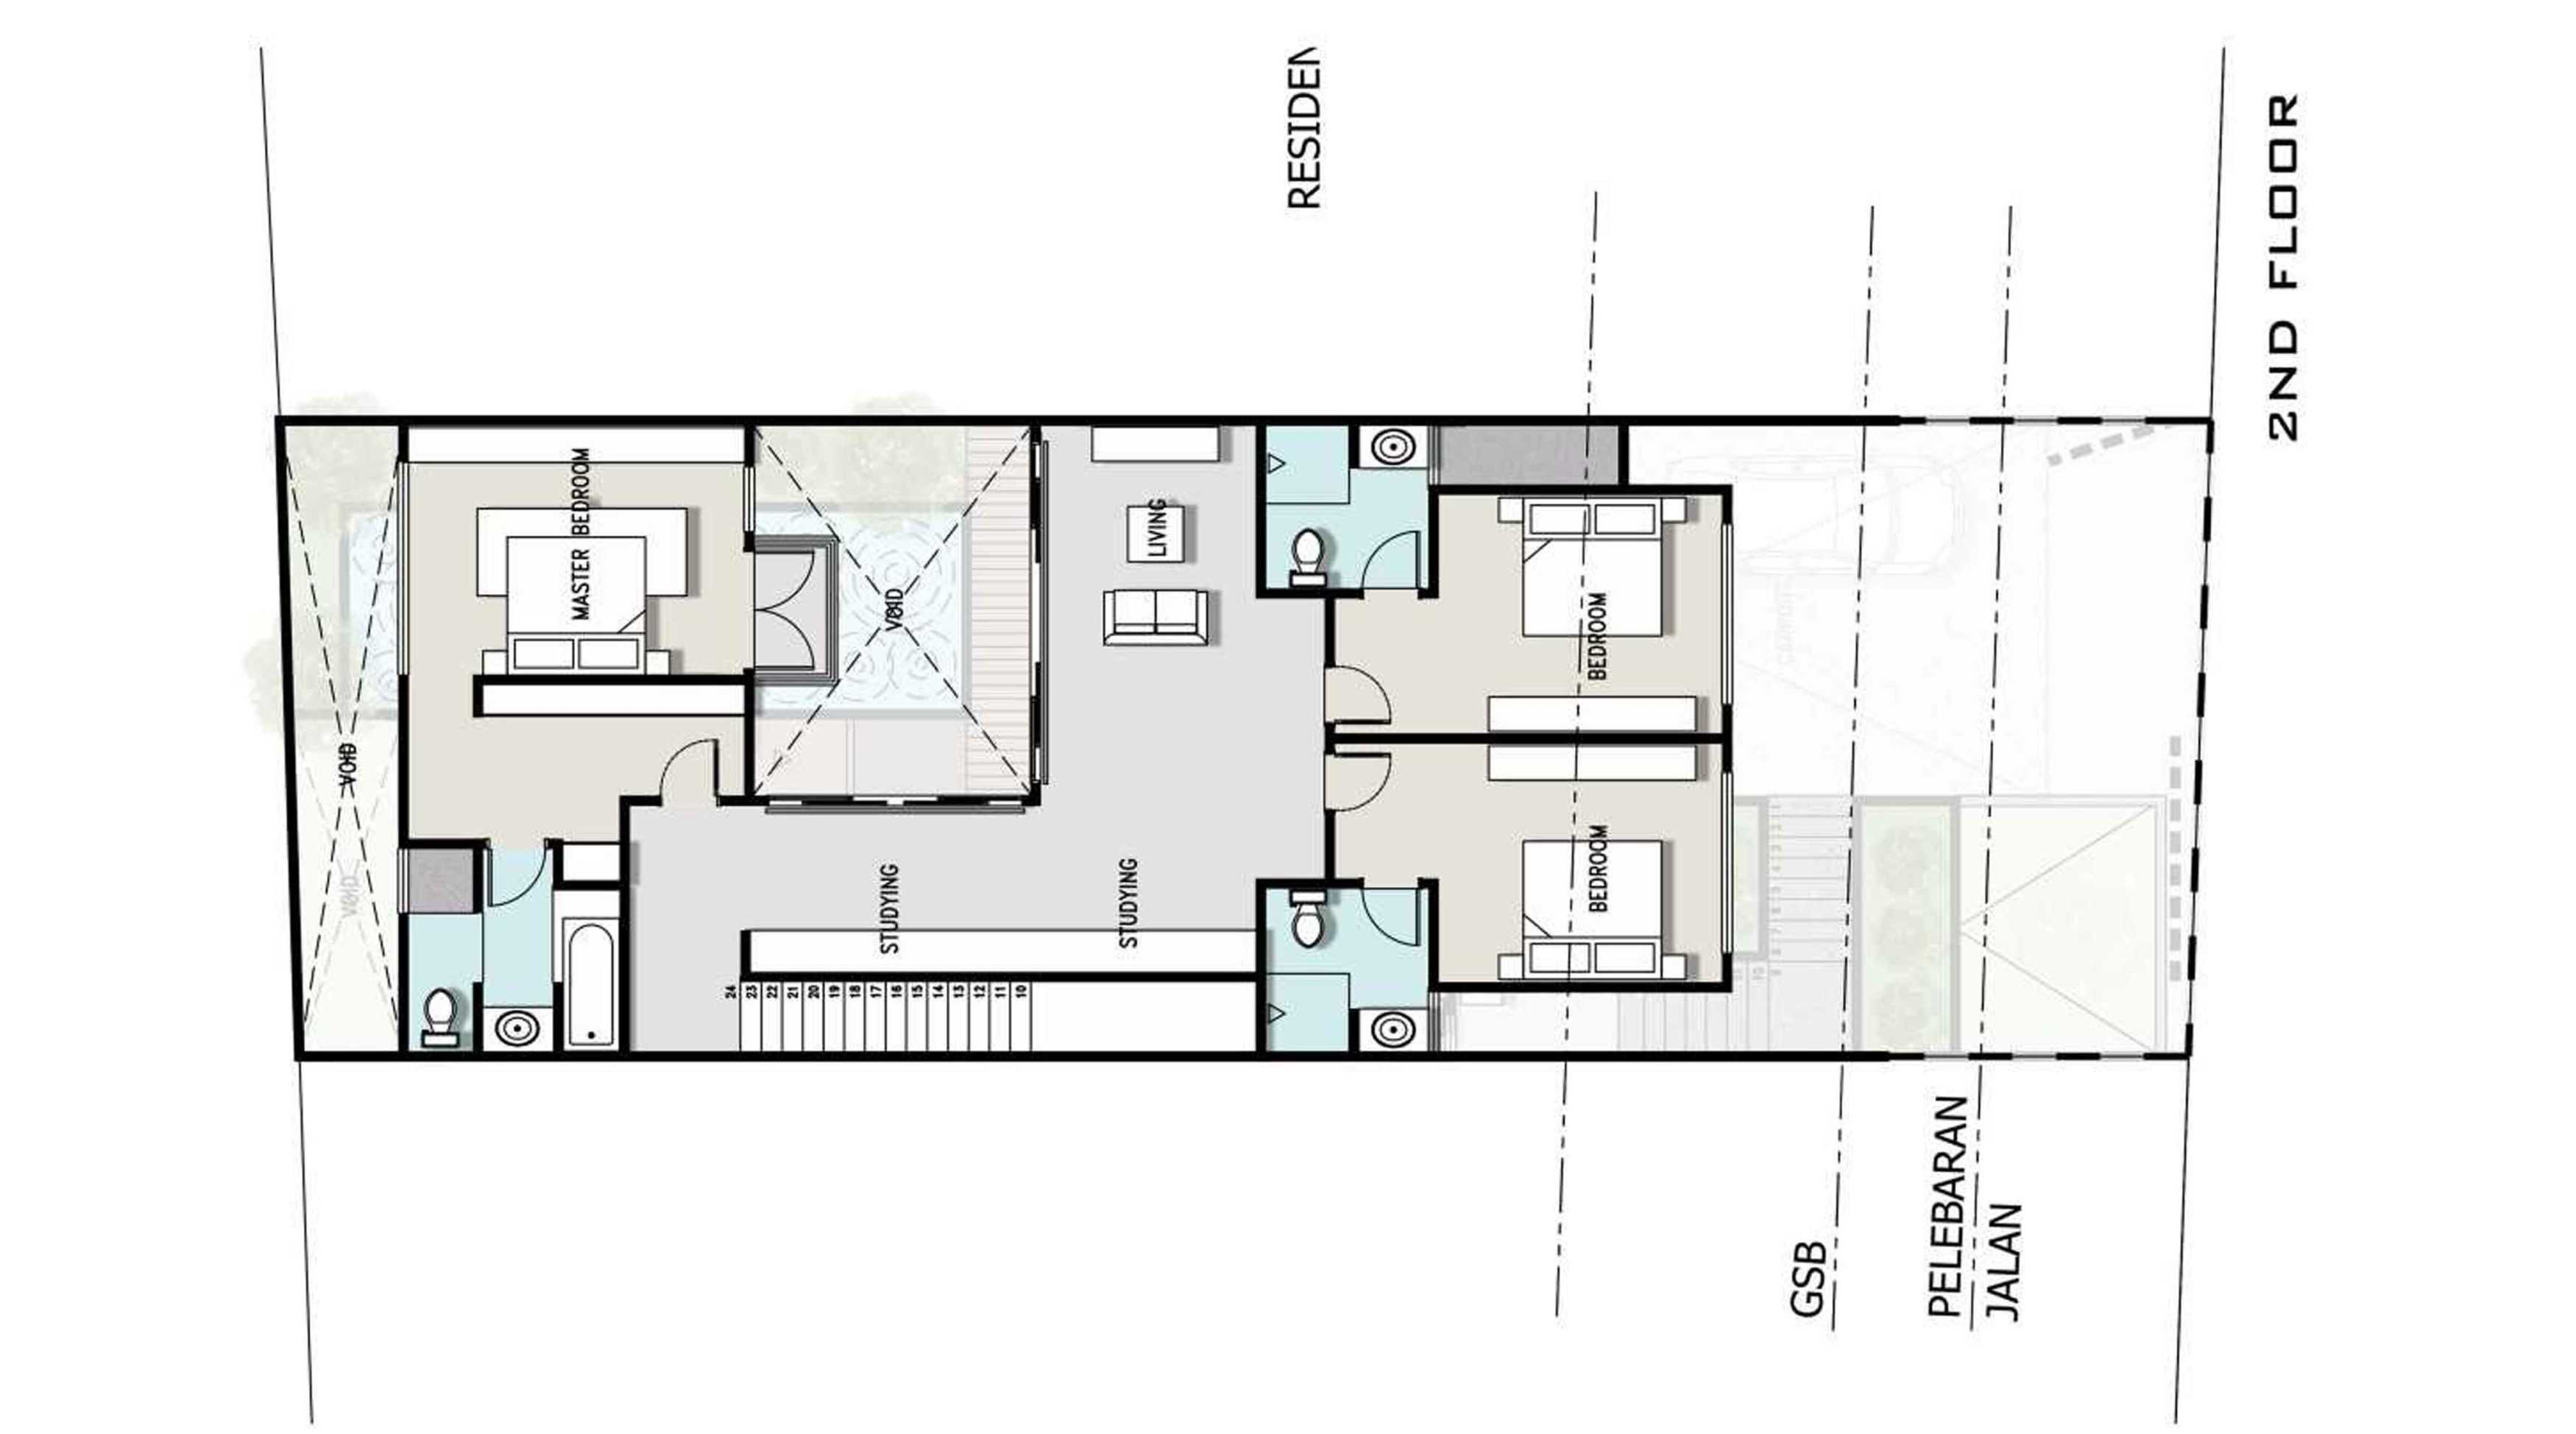 Zigzag Architecture Studio F House Kemang - Pedurenan Daerah Khusus Ibukota Jakarta, Indonesia Daerah Khusus Ibukota Jakarta, Indonesia 2   37009